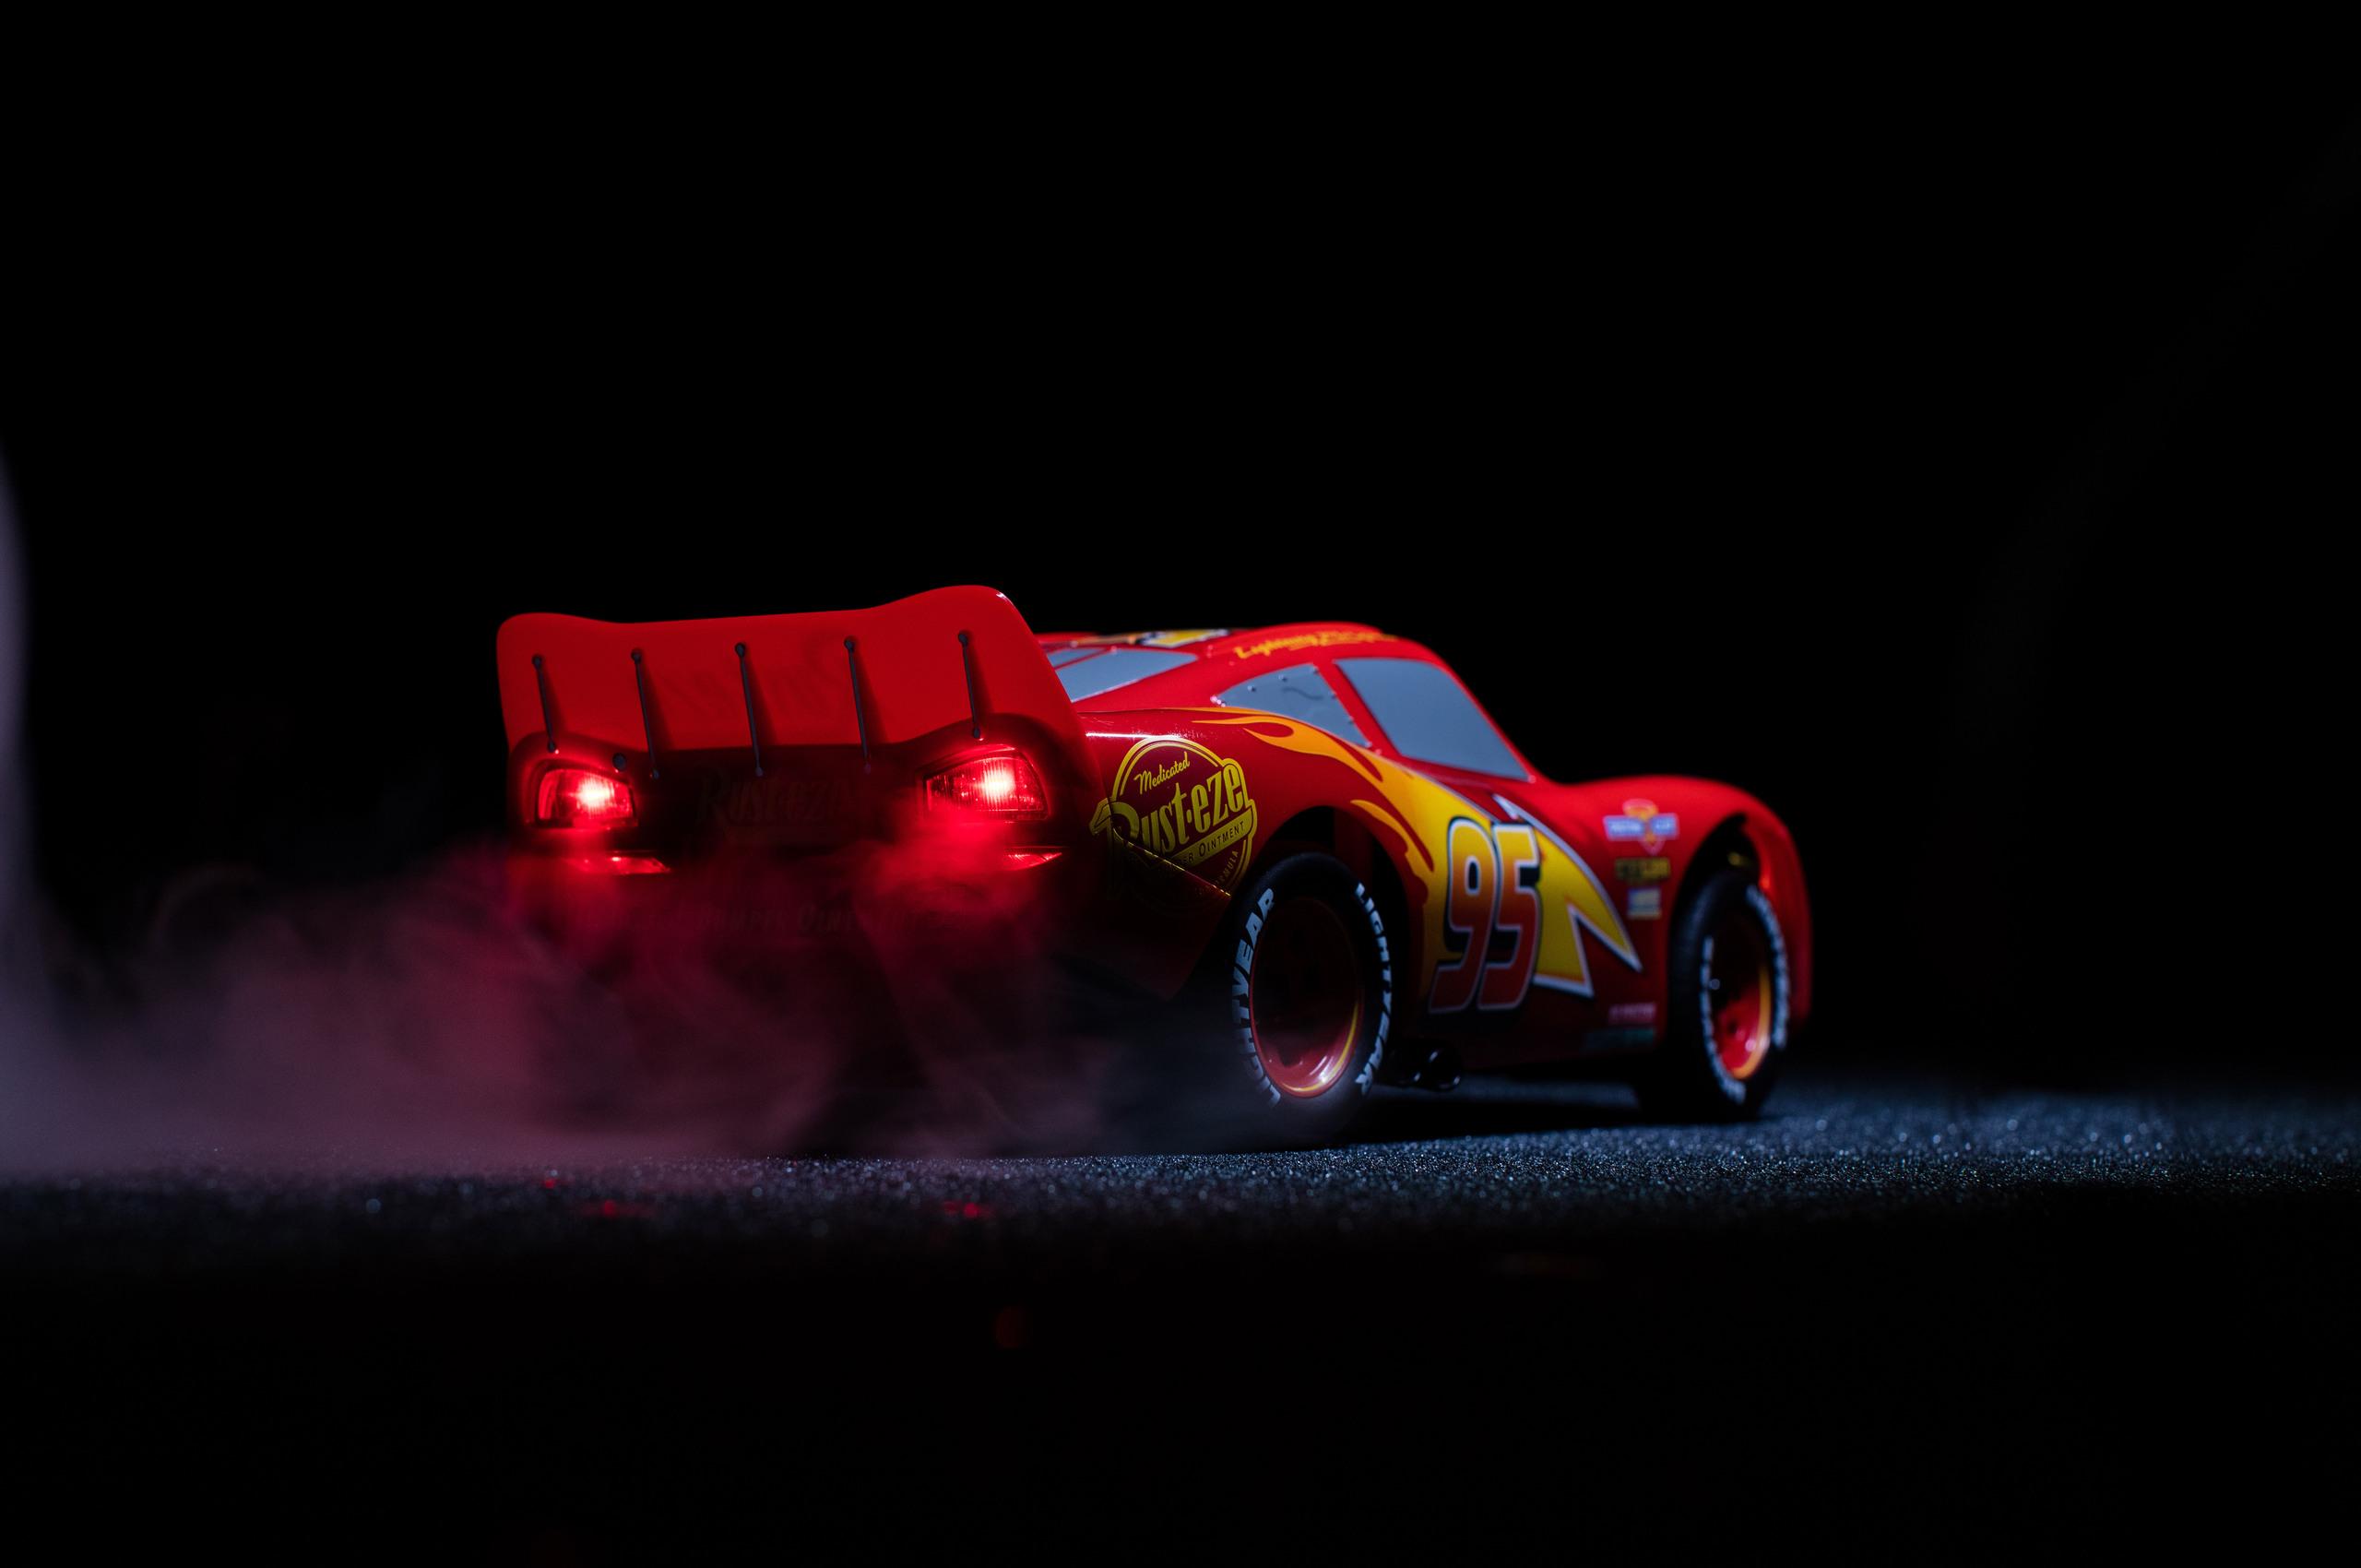 2560x1700 Lightning McQueen Cars 3 Pixar Disney 4k